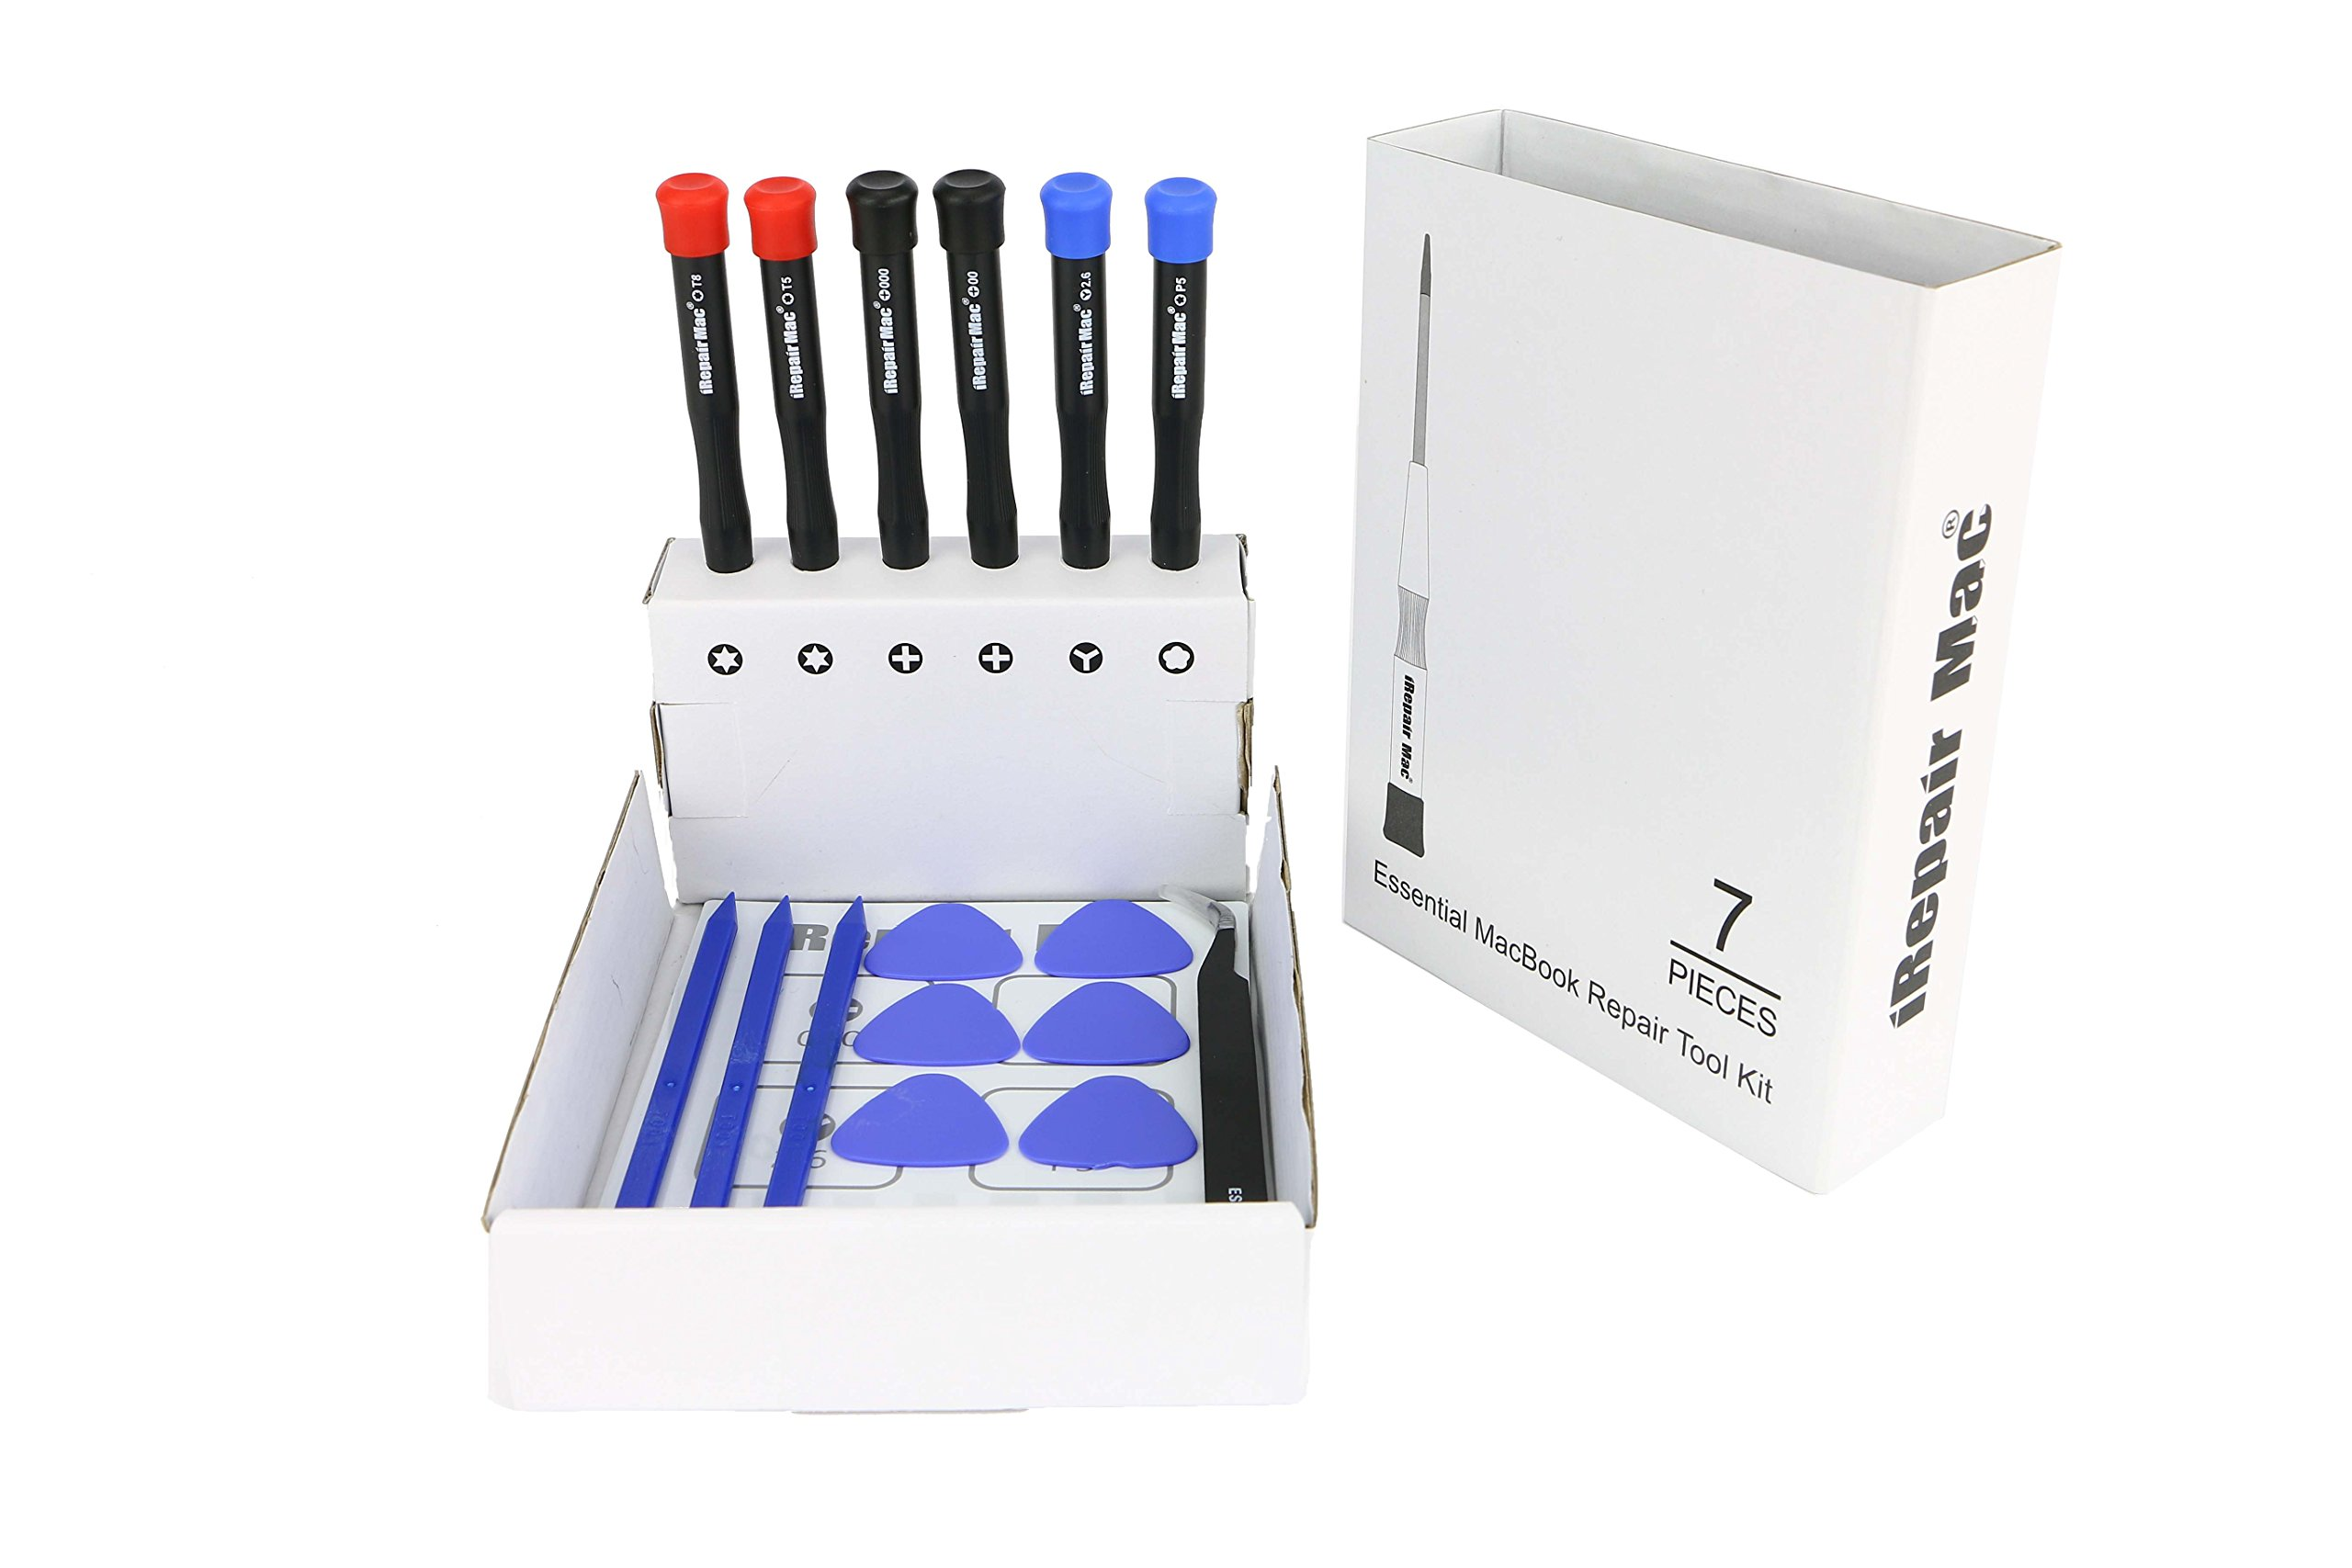 Repair Tool Kits with Magnetic Mat for MacBook Pro, MacBook Retina and MacBook Air Repair and Maintenance (17 Piece)